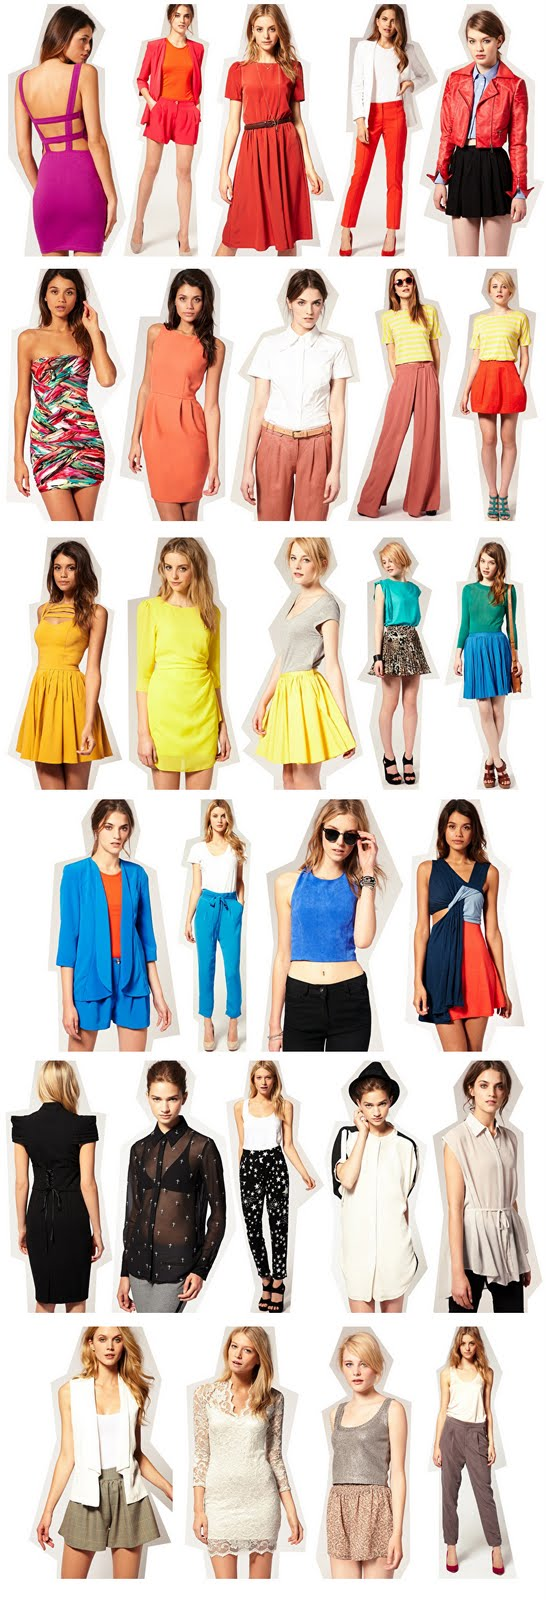 modne kolory